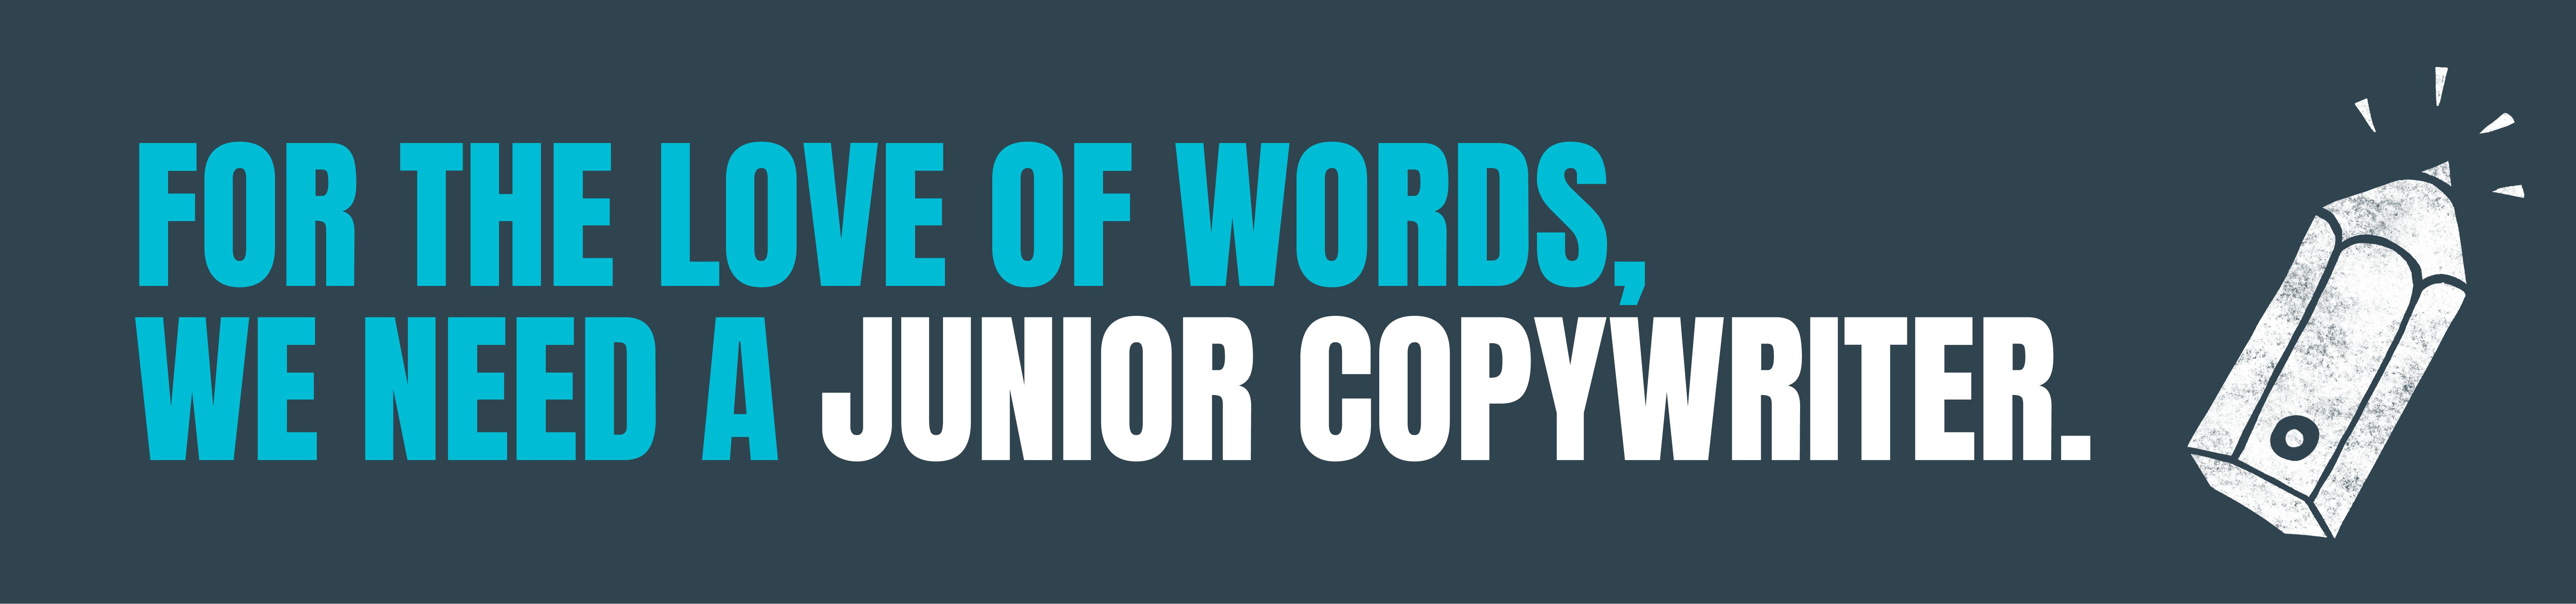 Jun Coprwriter website banner